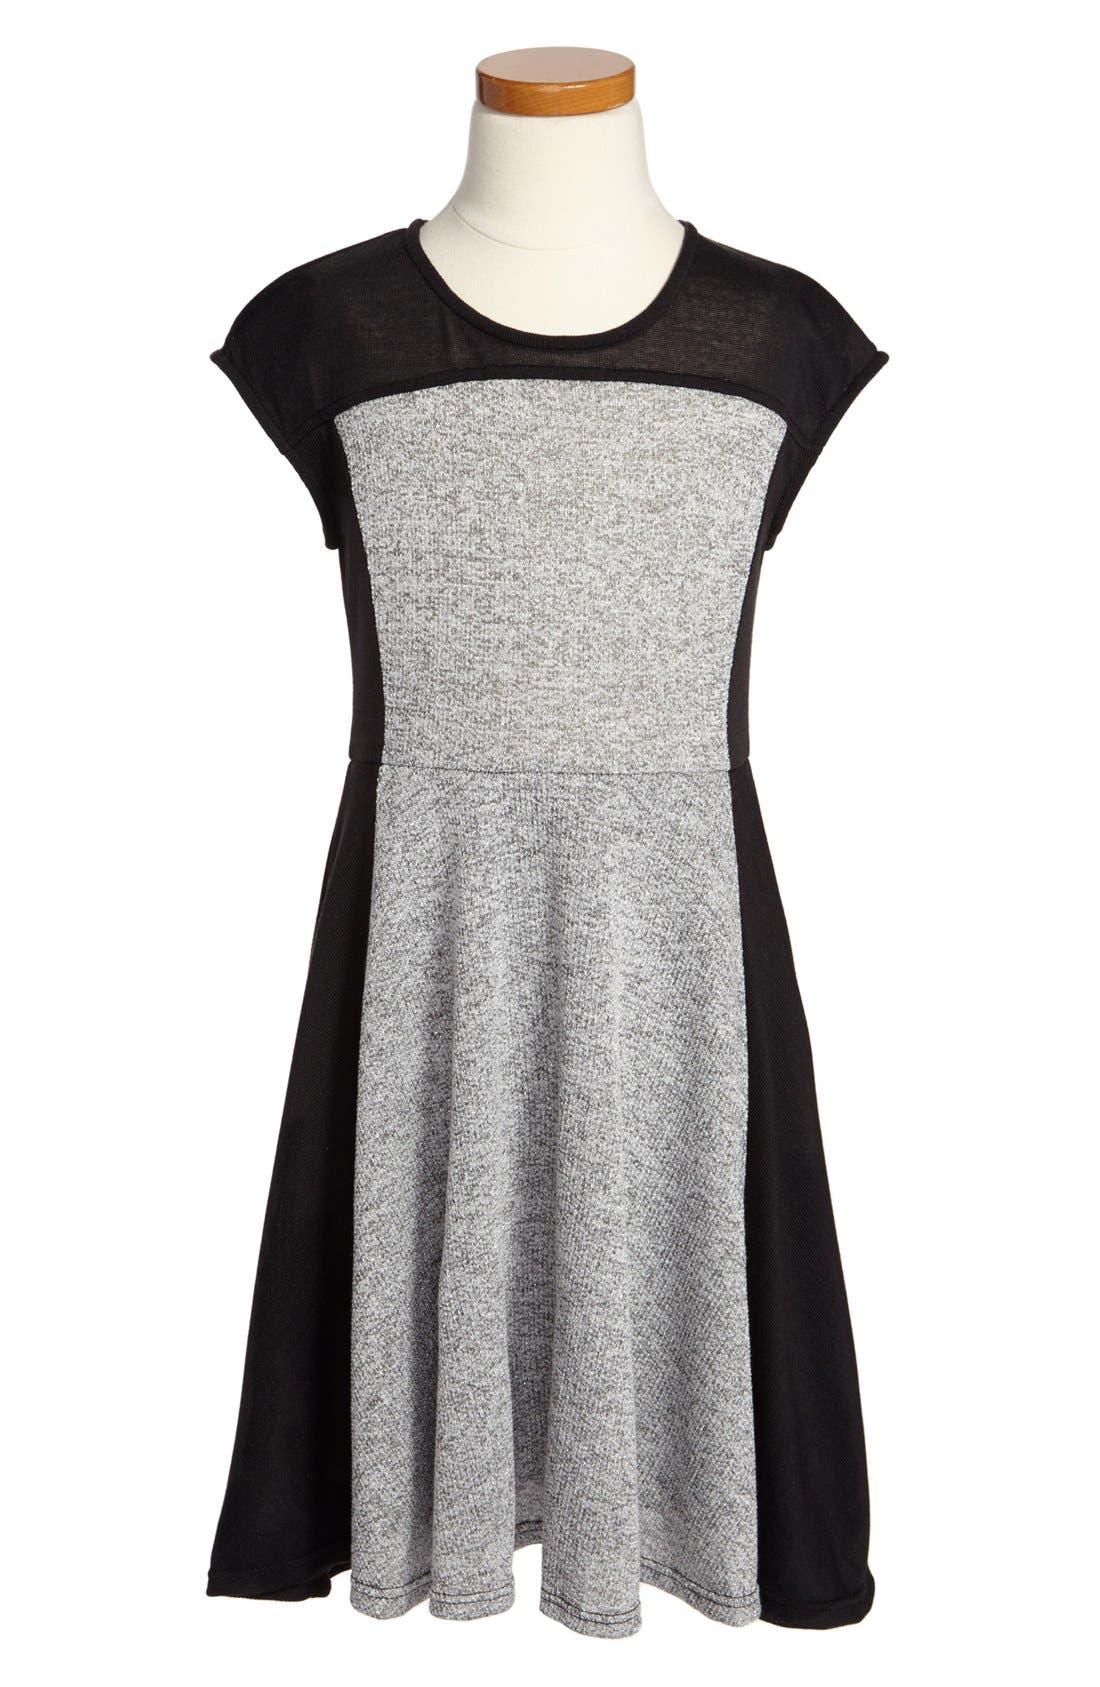 Main Image - Kiddo Knit Dress (Big Girls)